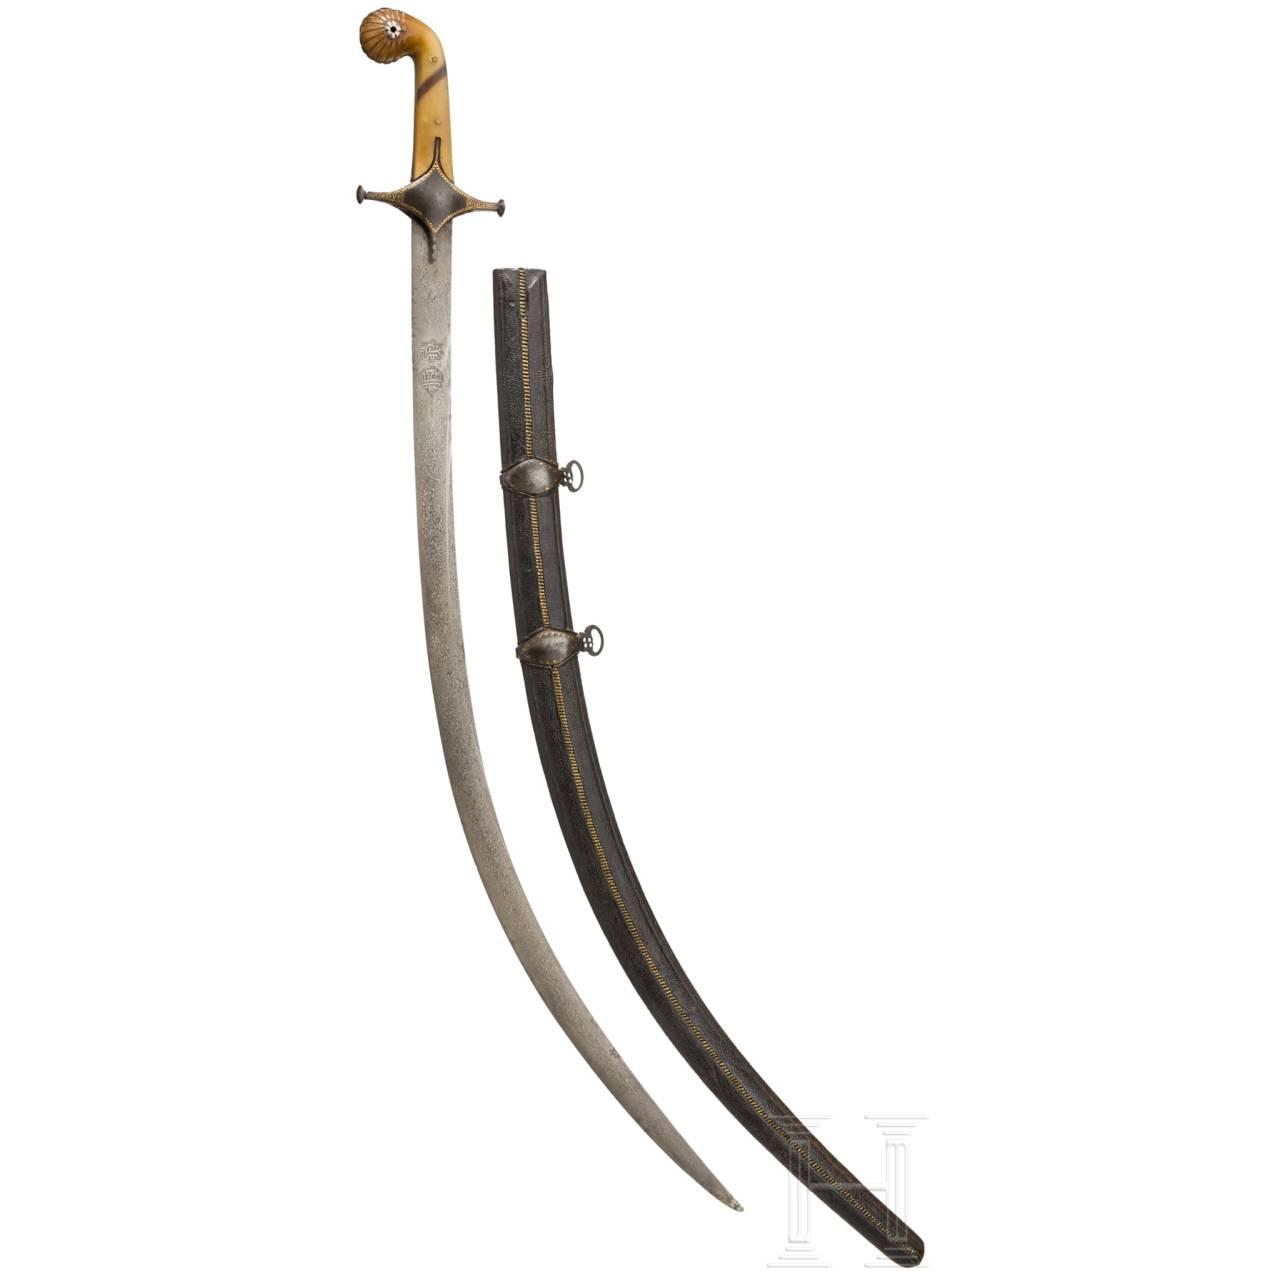 An Ottoman/Persian shamshir with a fine wootz-Damascus blade, circa 1800